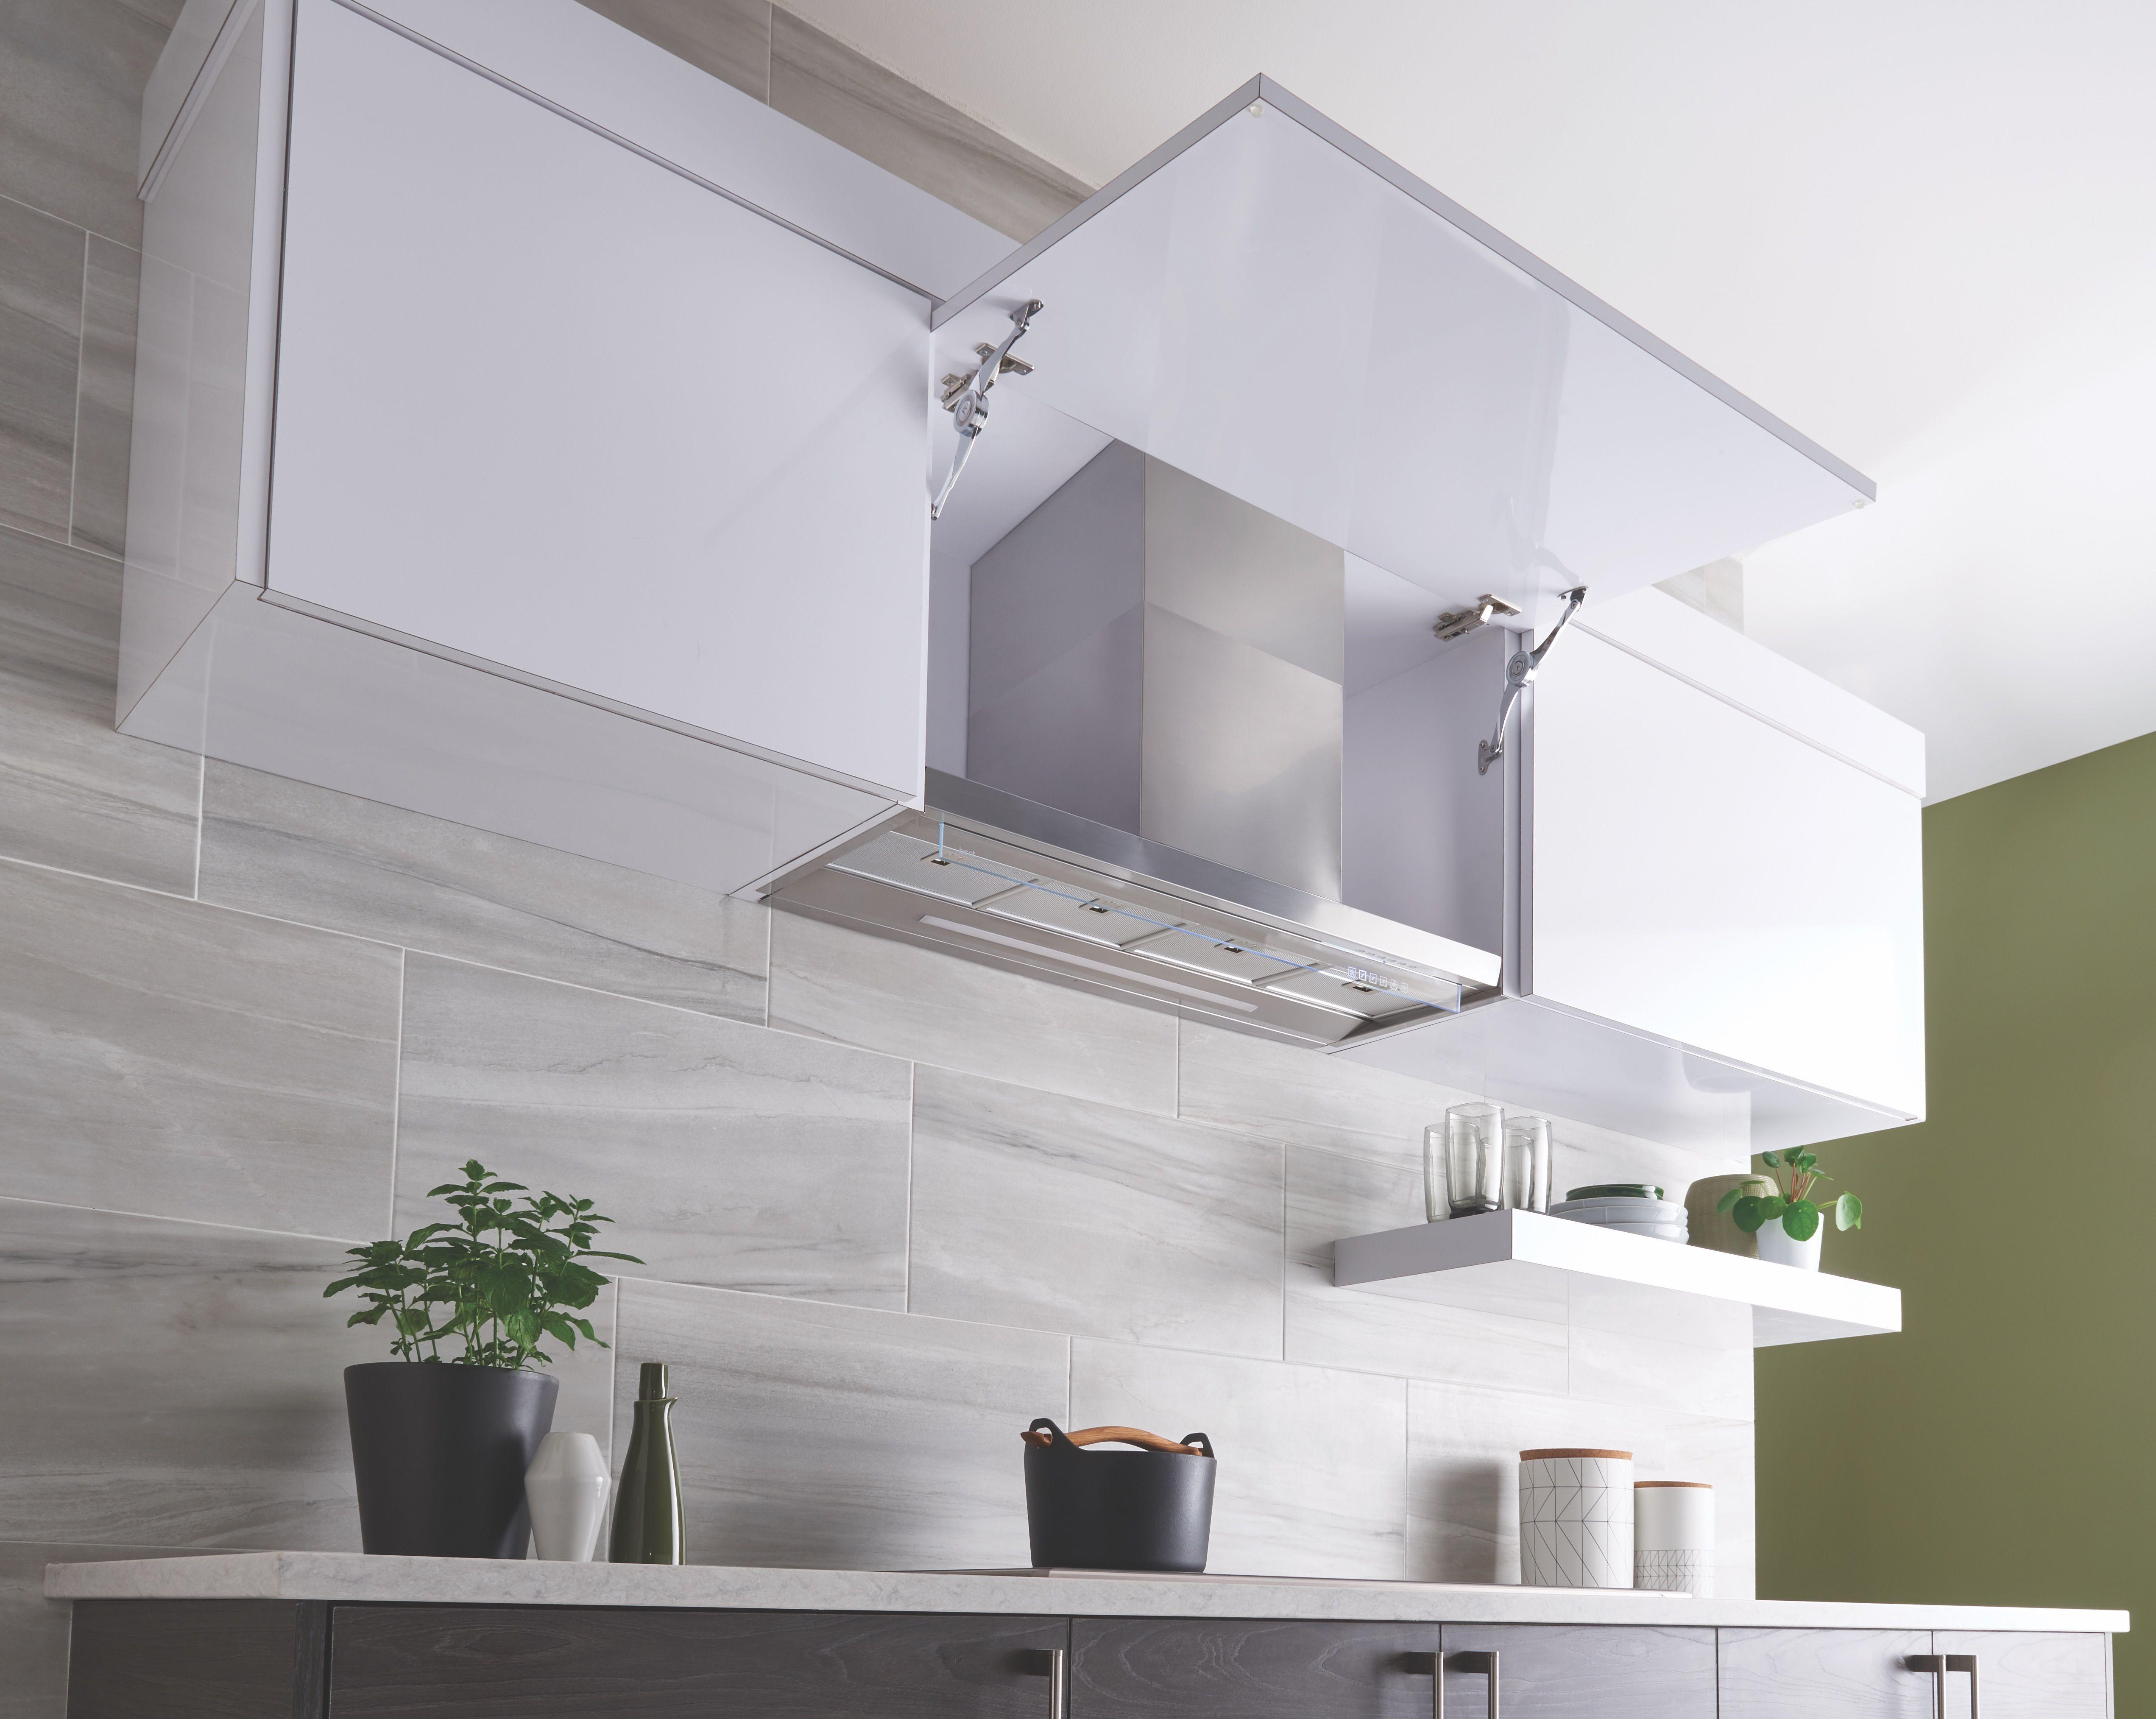 Hidden Cooktop Vent | Modern kitchen range hoods, Kitchen ...